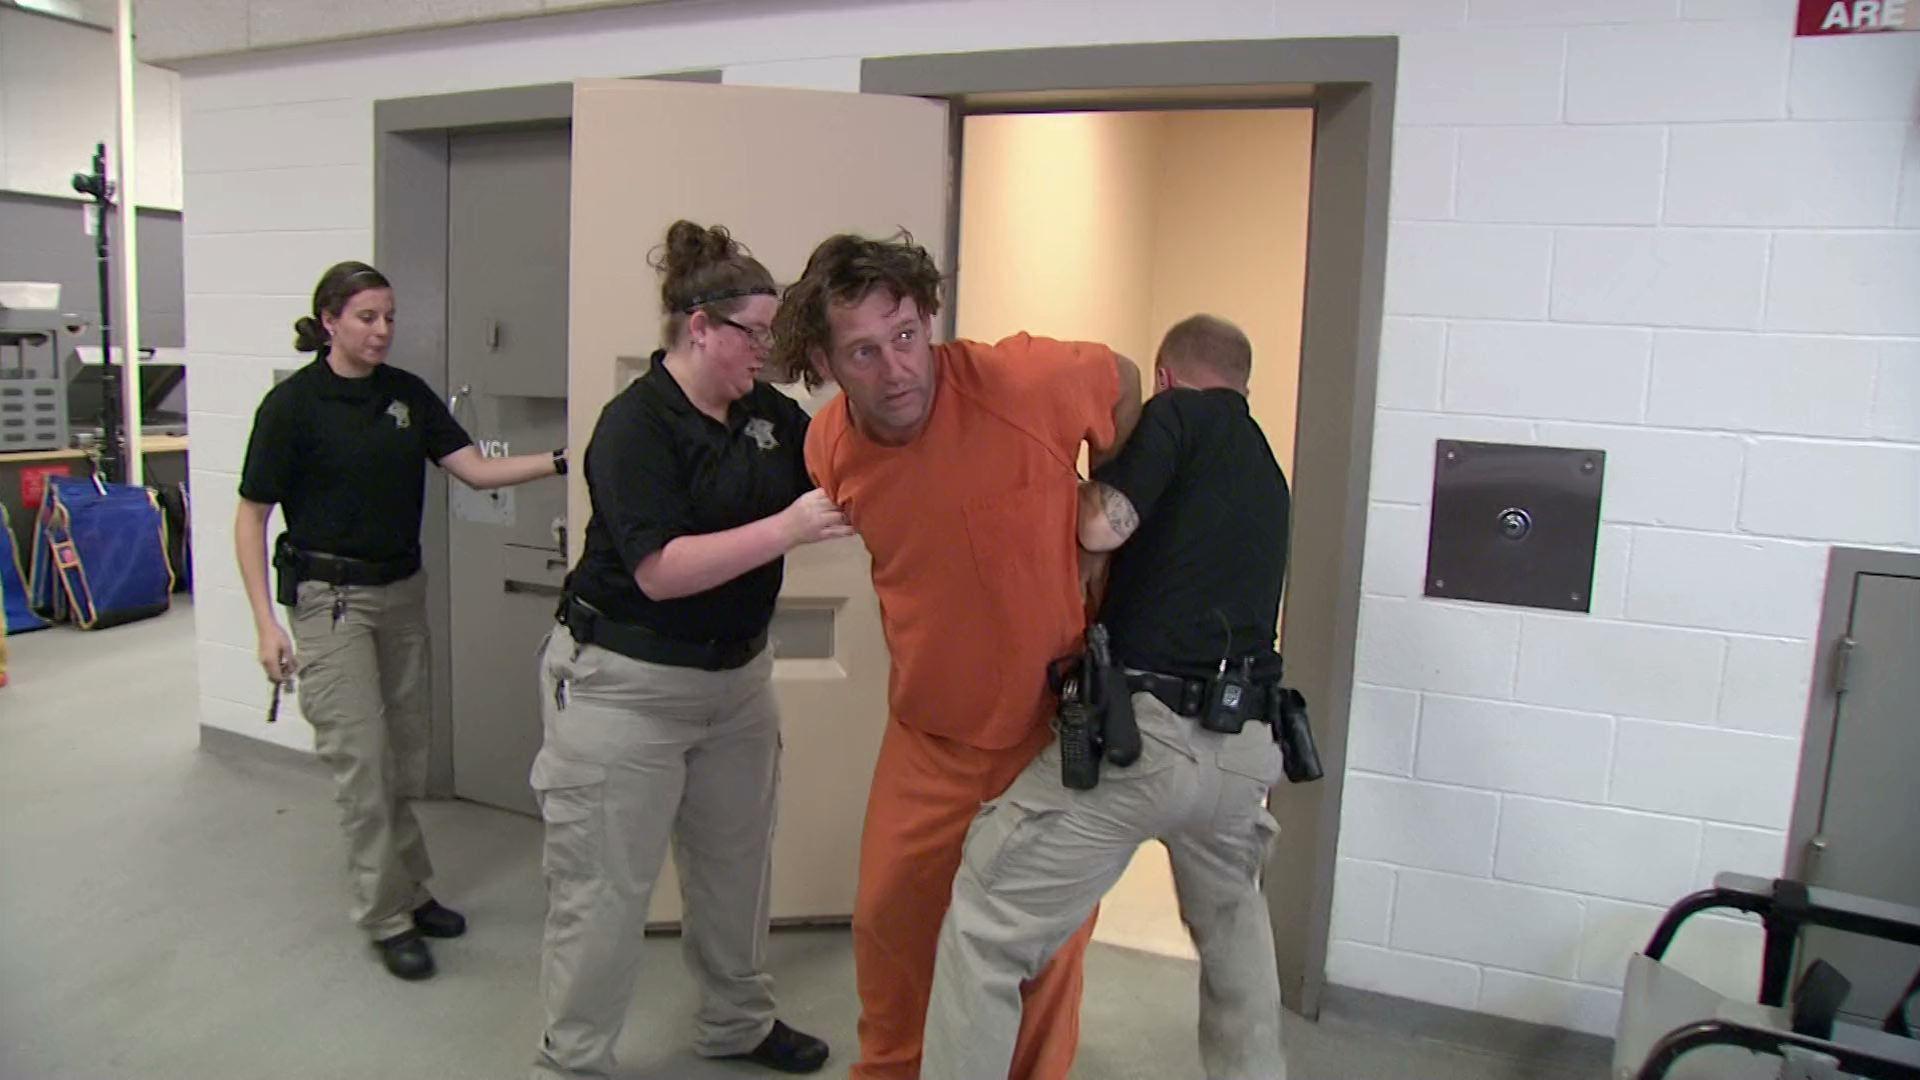 Las Vegas Jailhouse - Season 4 Episode 8: Episode 8 ...